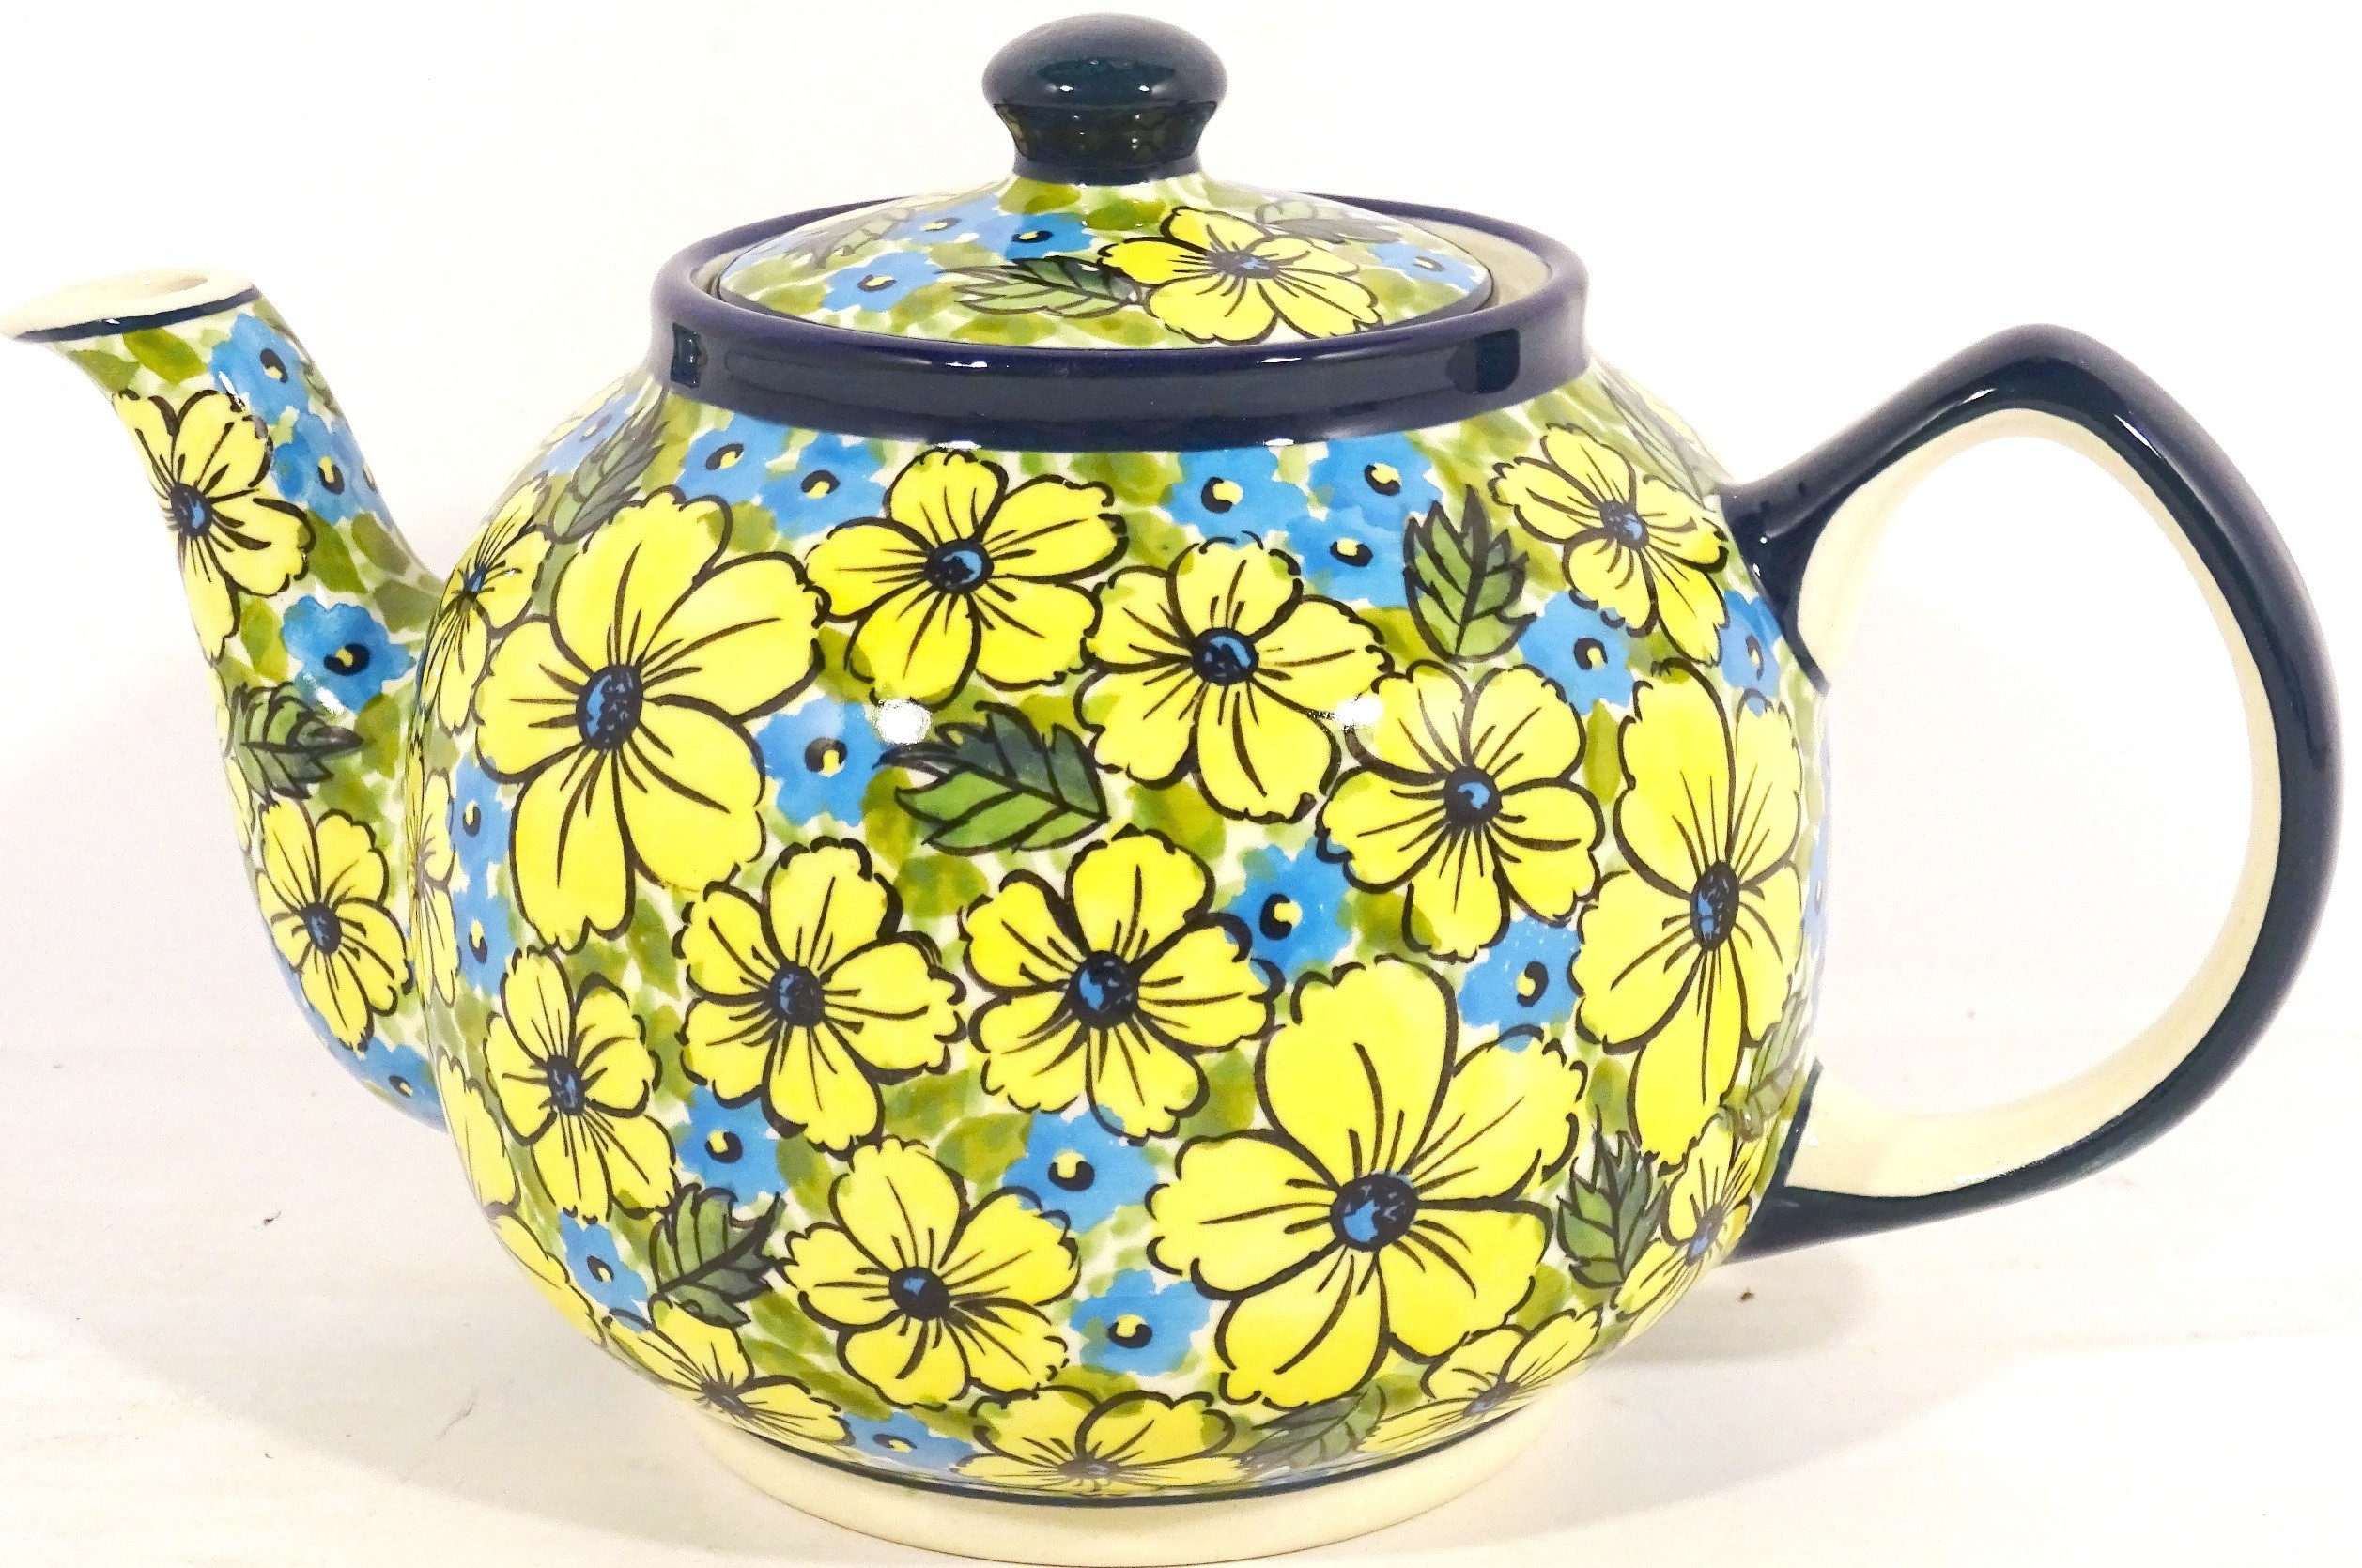 Pottery Avenue 34 oz CITRINE Stoneware Teapot | UNIKAT